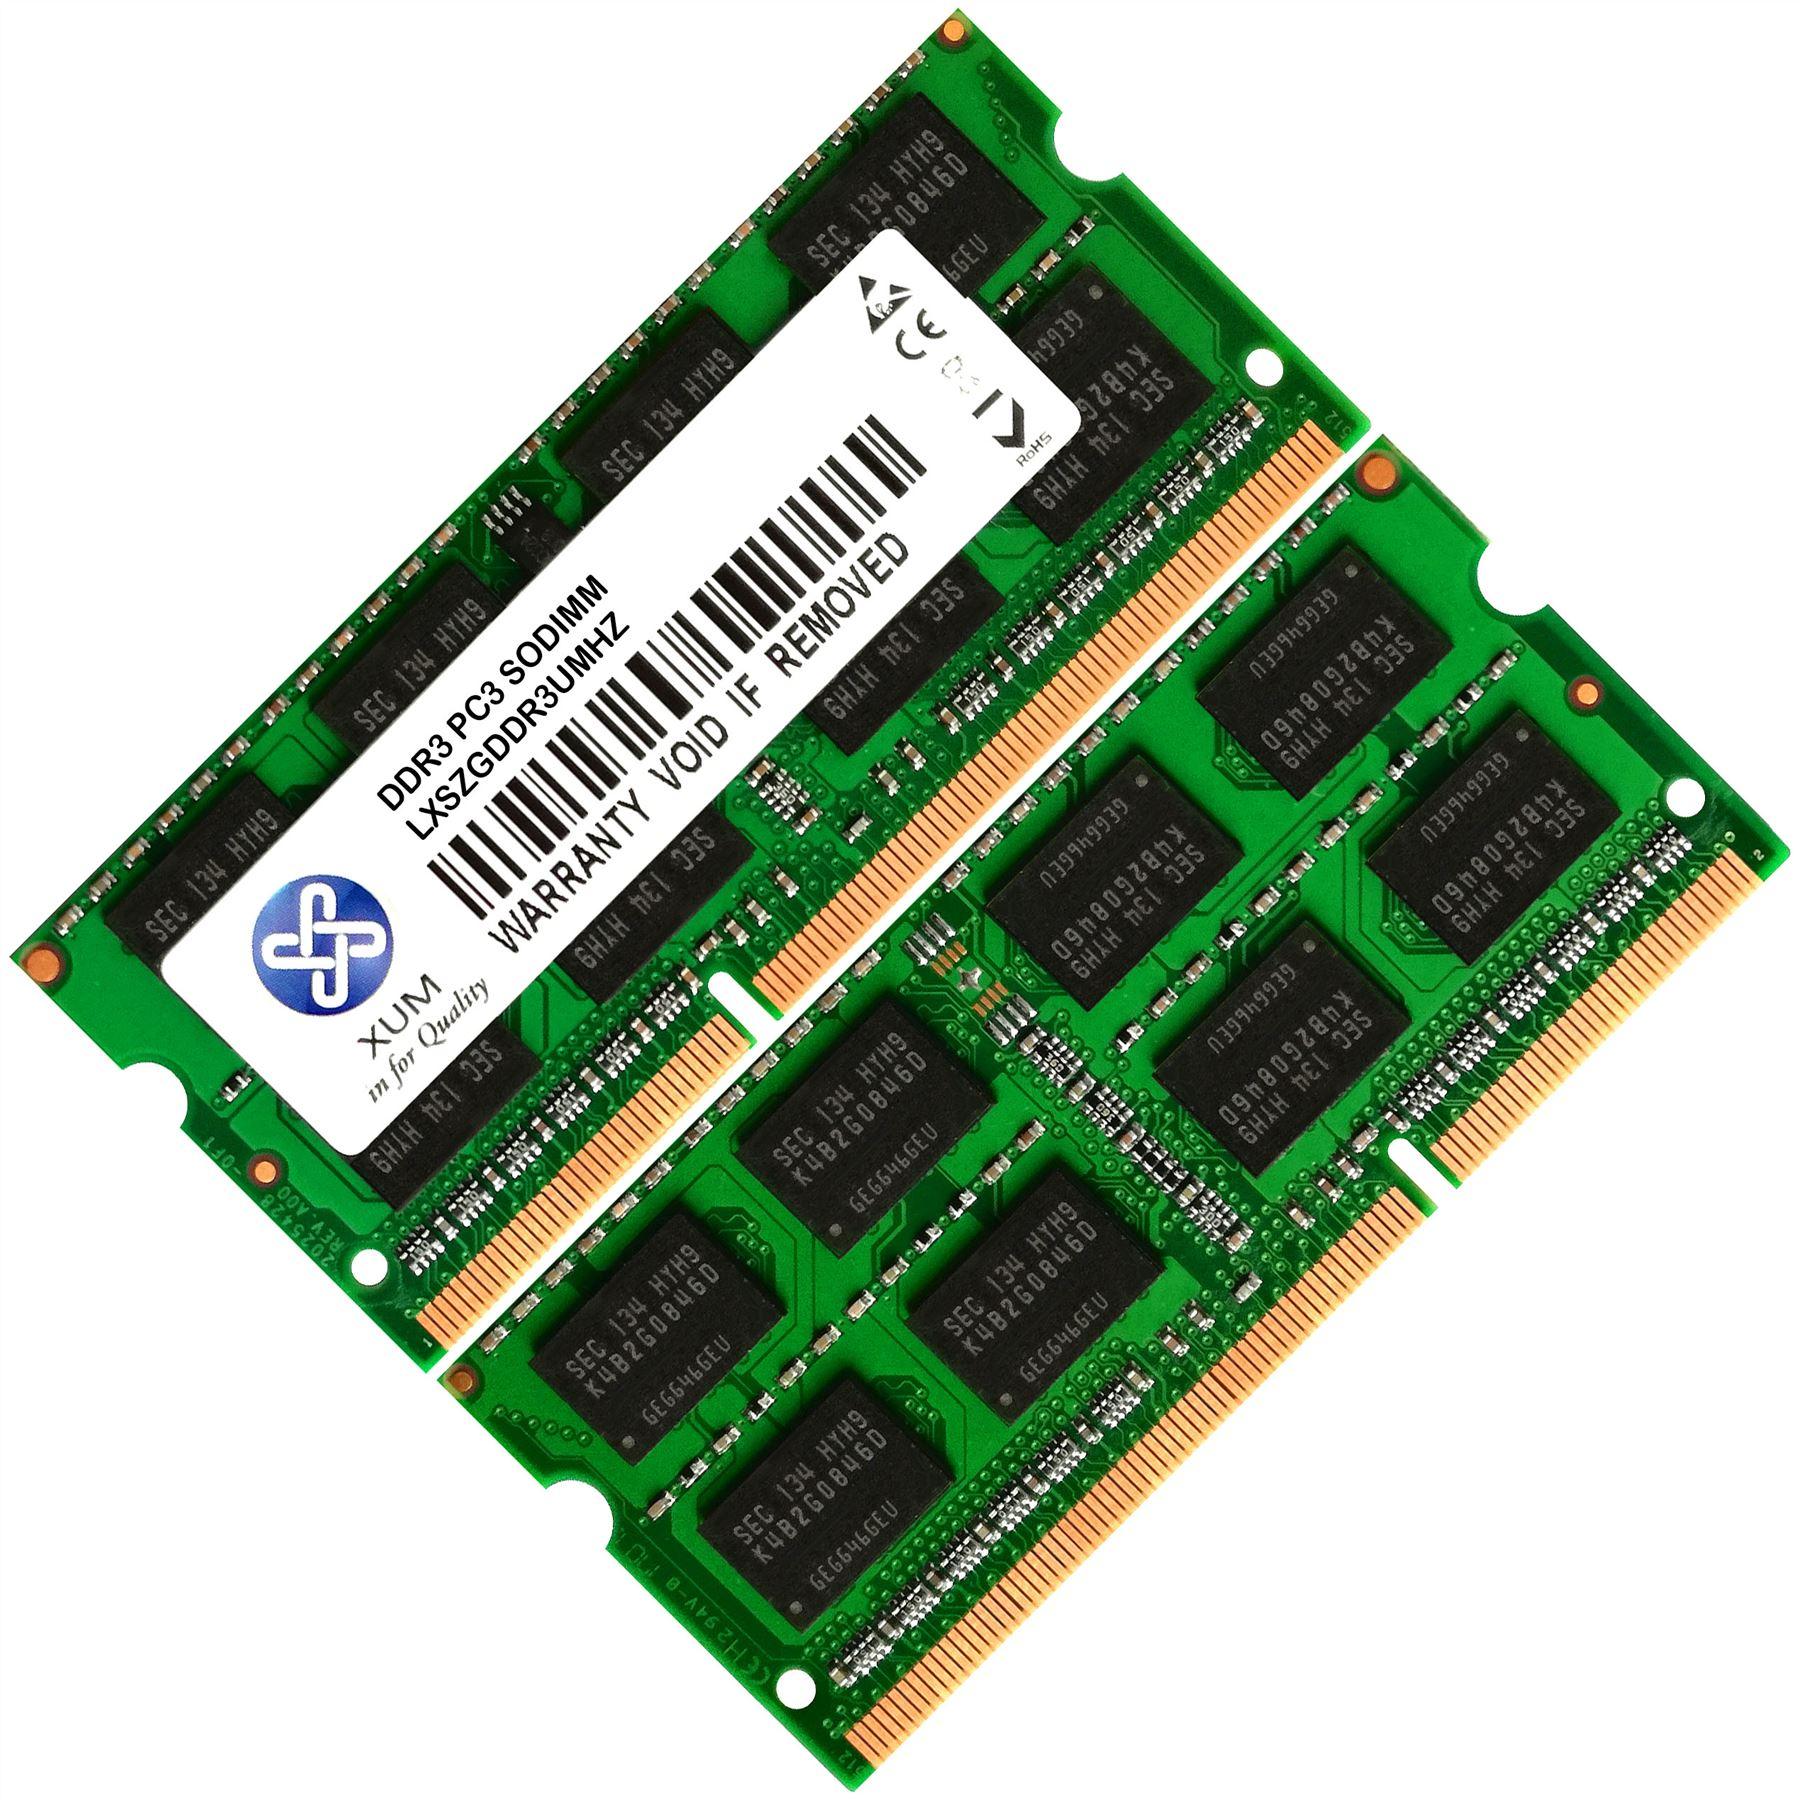 Memoria-Ram-4-Toshiba-Satellite-Laptop-A660-15E-A660-15P-A665-14C-Nuevo-2x-Lot